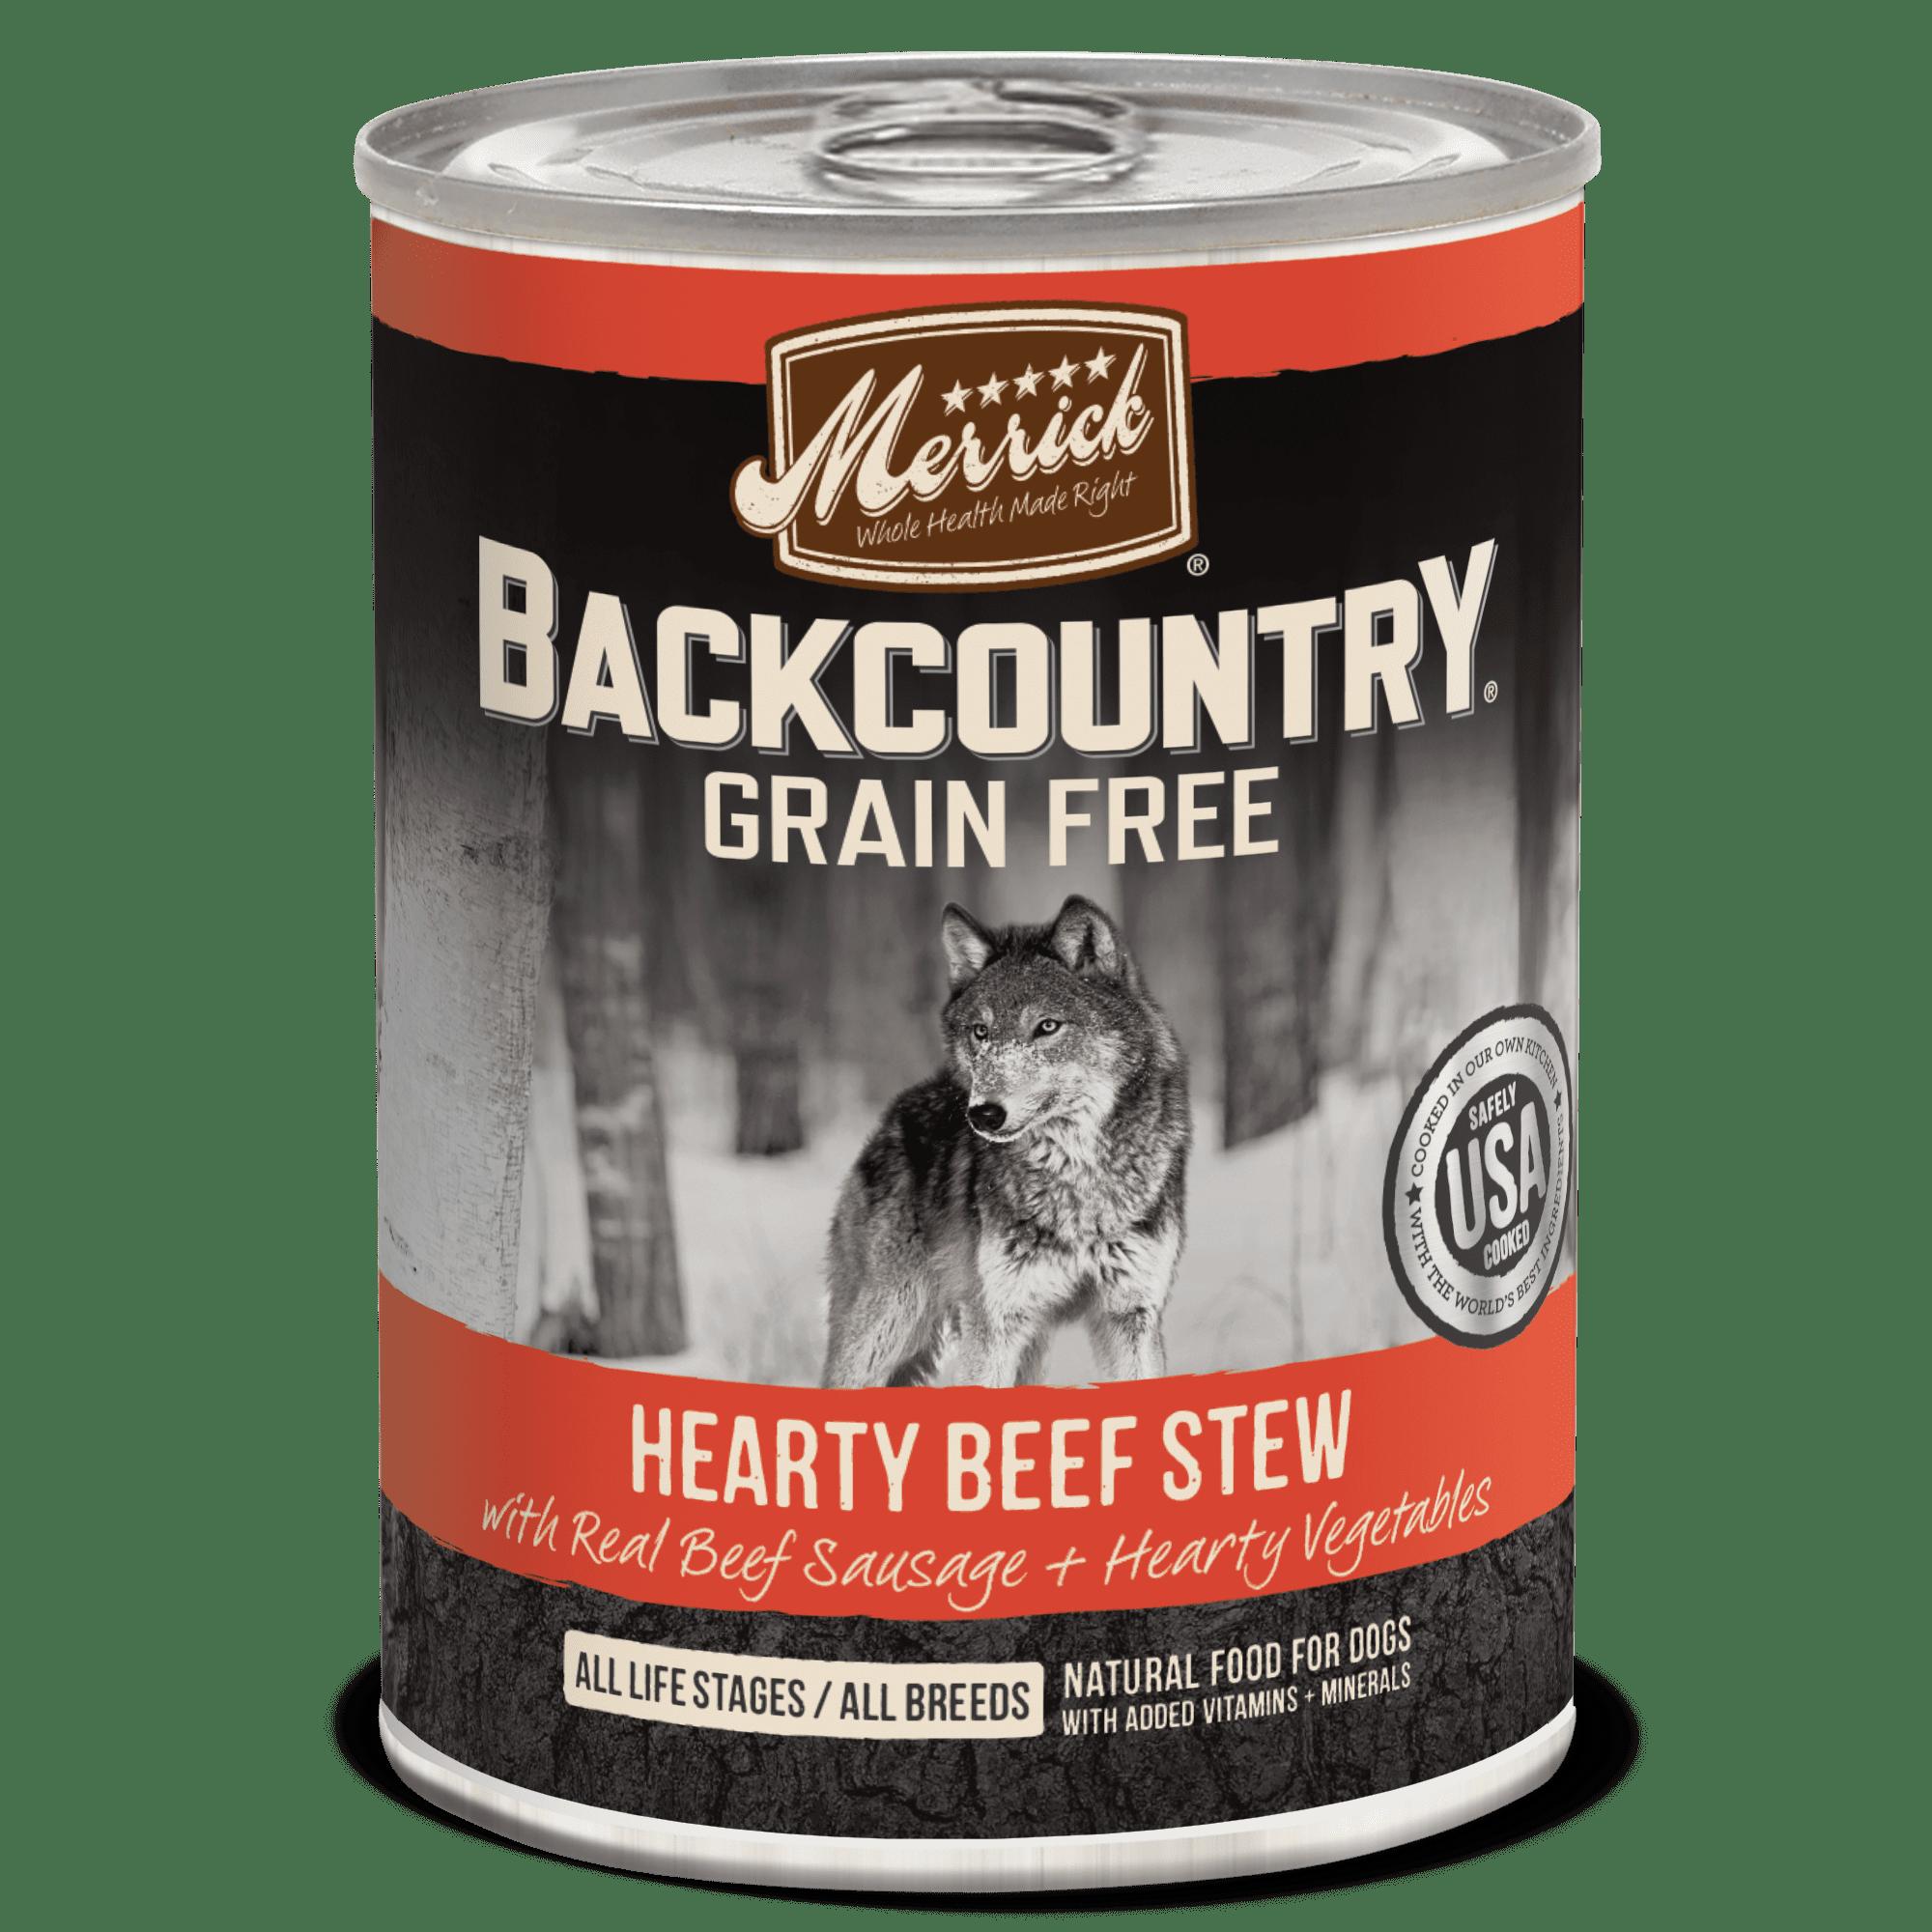 Merrick Backcountry Grain-Free Hearty Beef Stew Wet Dog Food, 12.7 Oz, 12 Ct